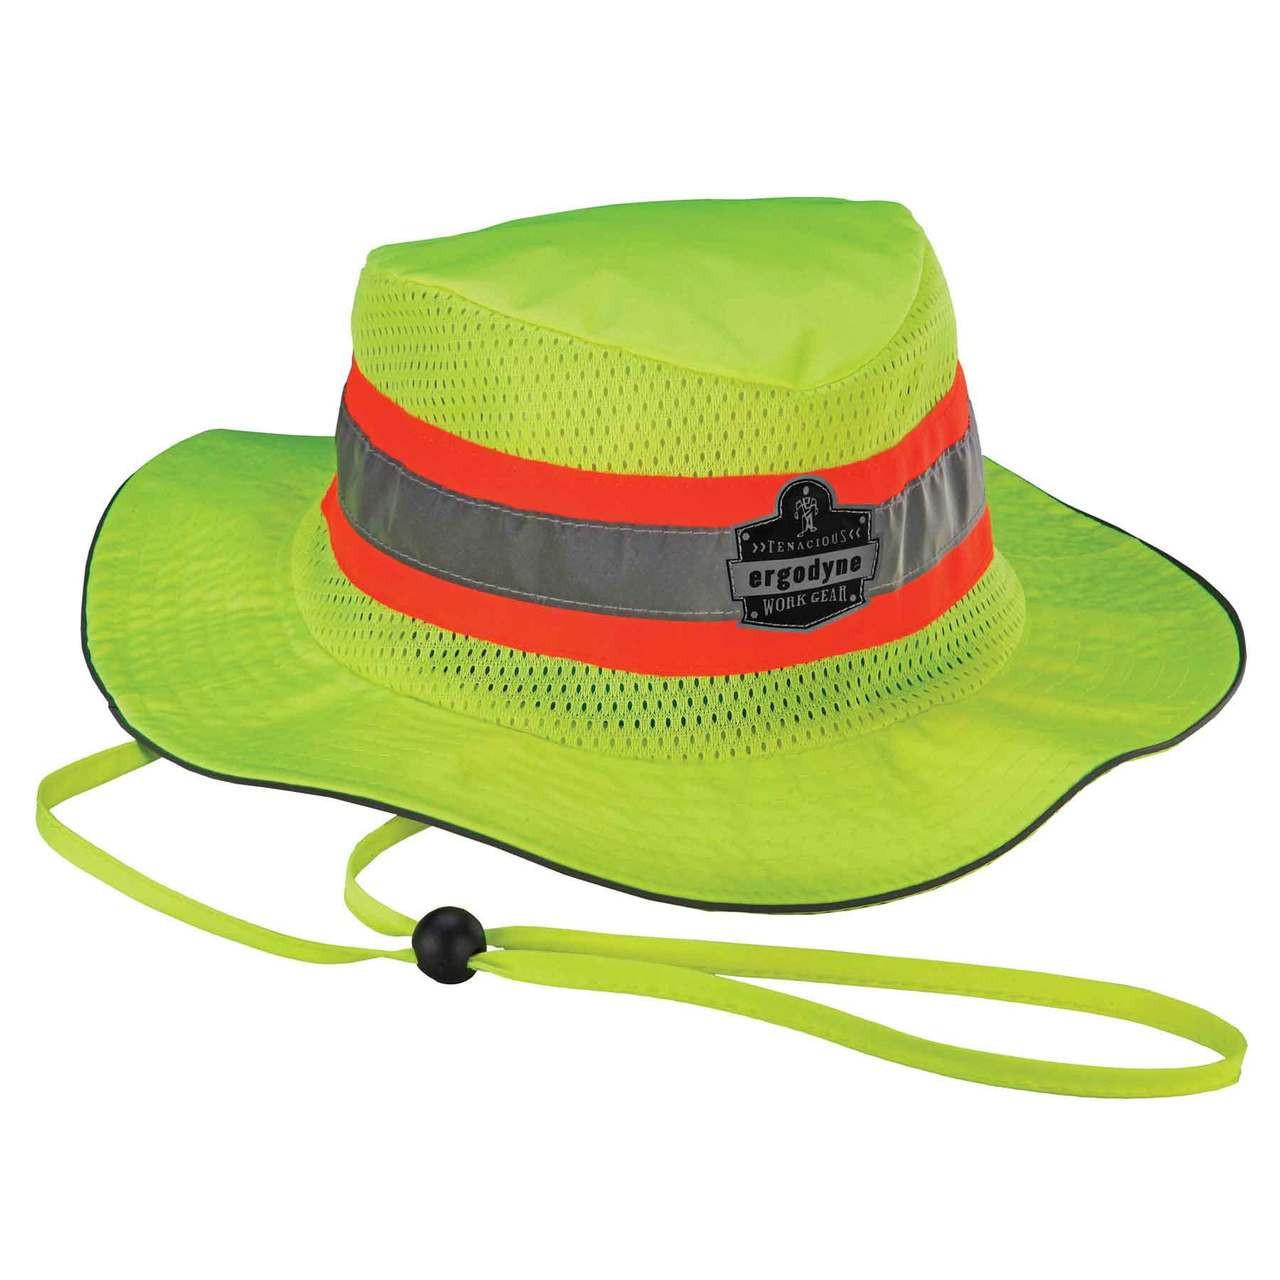 4f8ad1dd4a6a7 Ergodyne Chill-Its 8935CT L XL Lime Evap. Class Headwear Hi-Vis Ranger Hat  w CT - Jendco Safety Supply